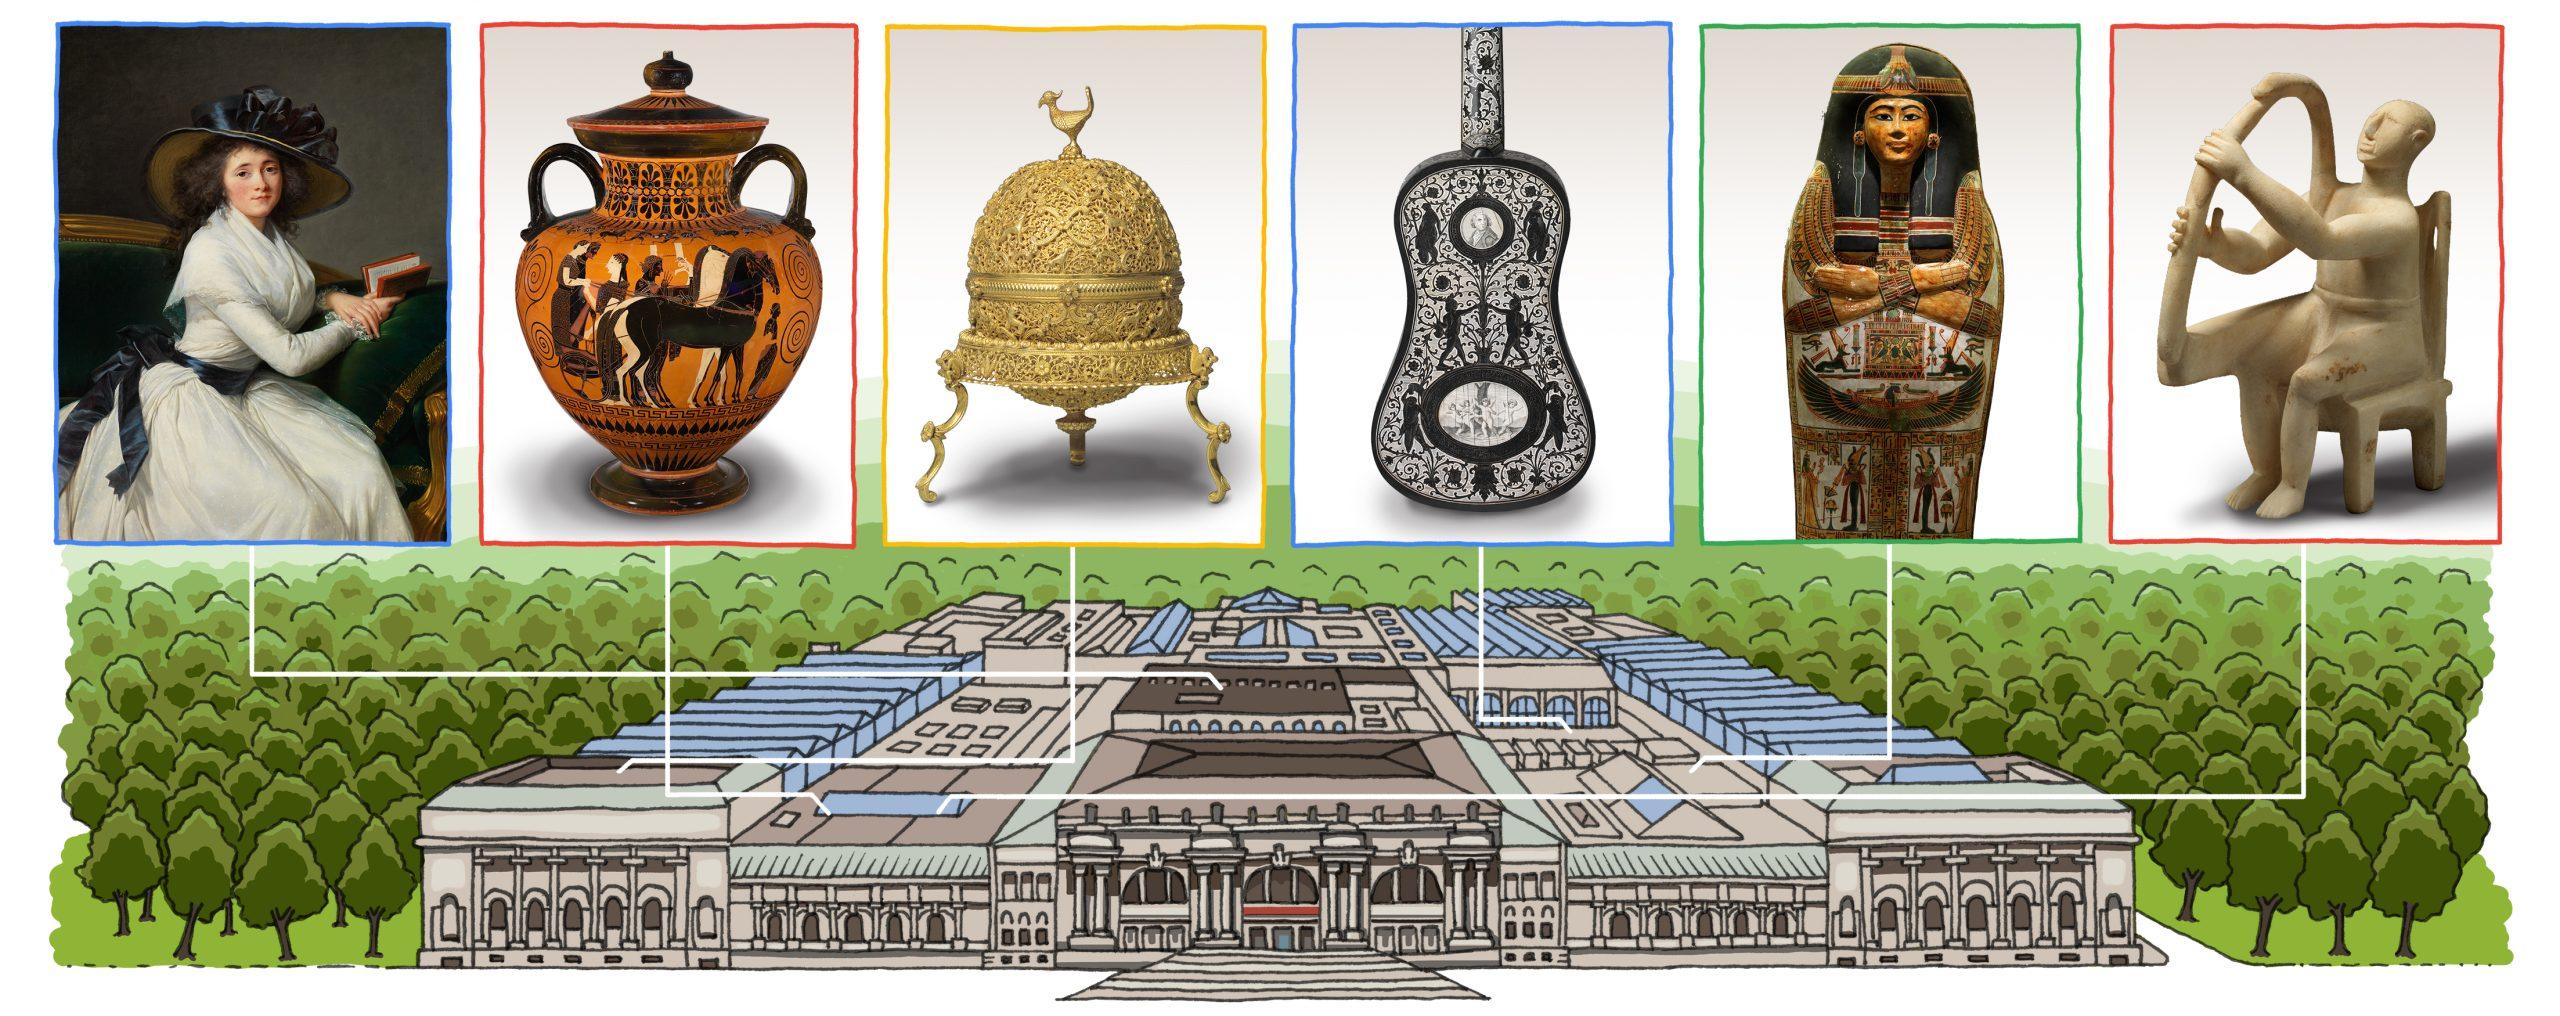 Google Doodle Celebrates the Metropolitan Museum's 151st Anniversary